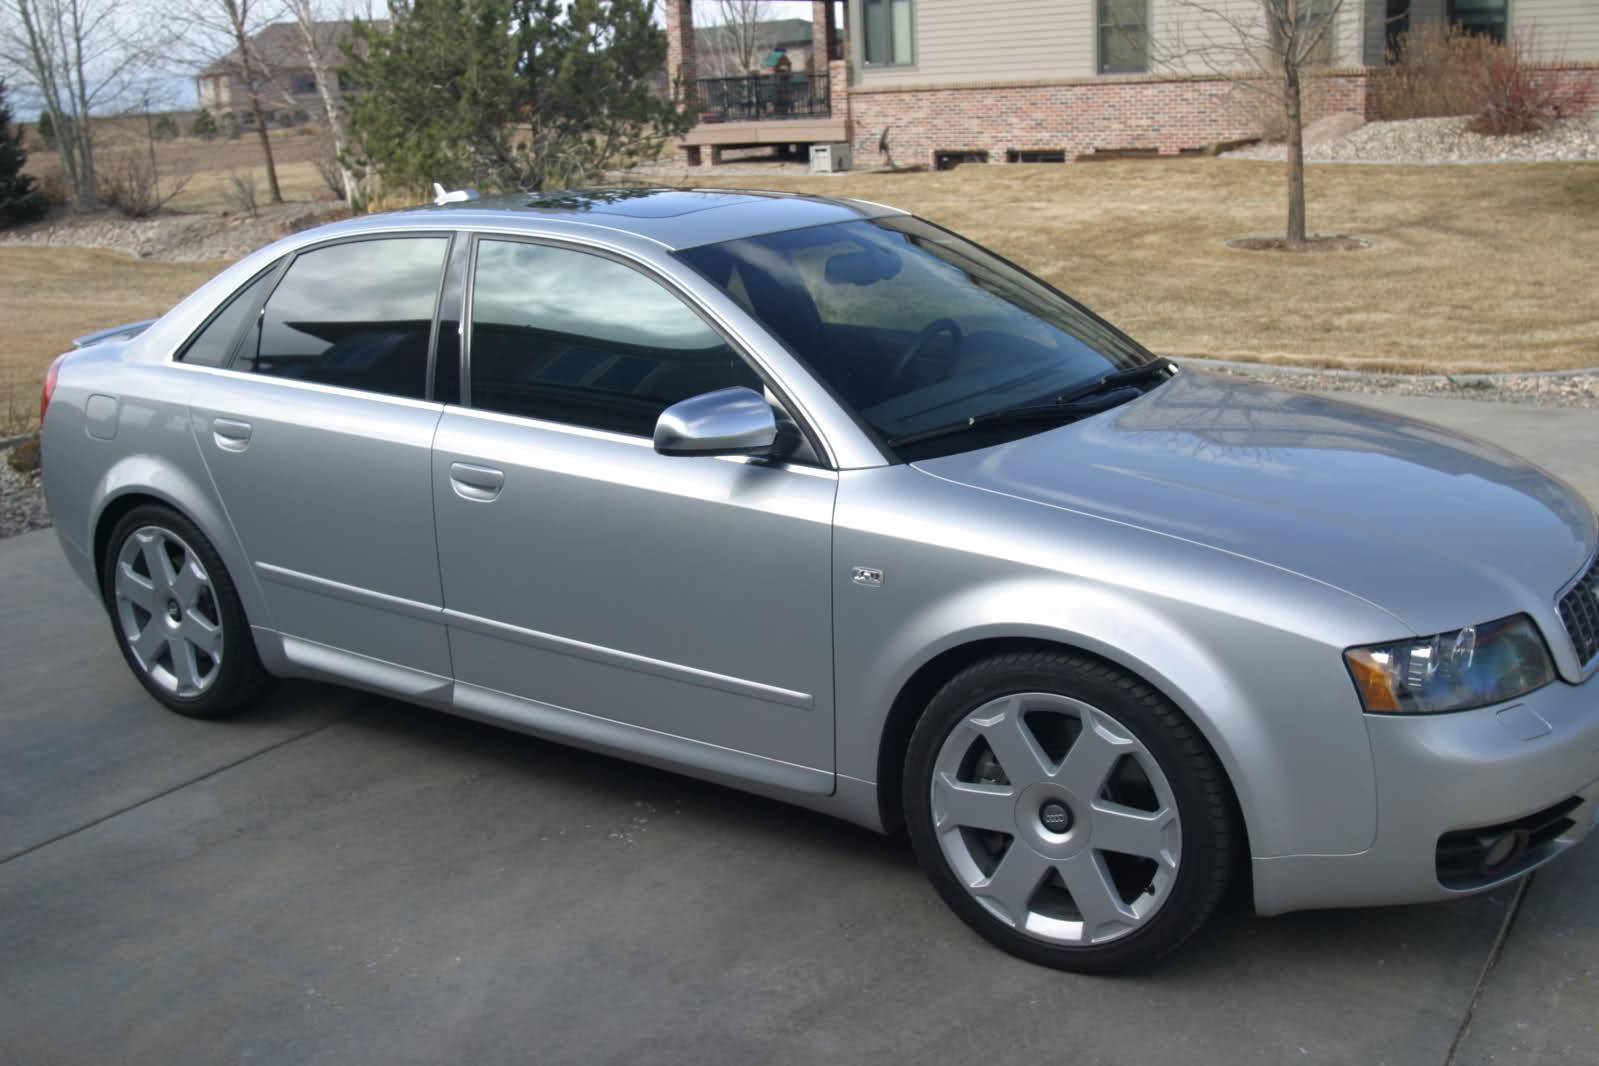 2005 Audi S4 Image 16